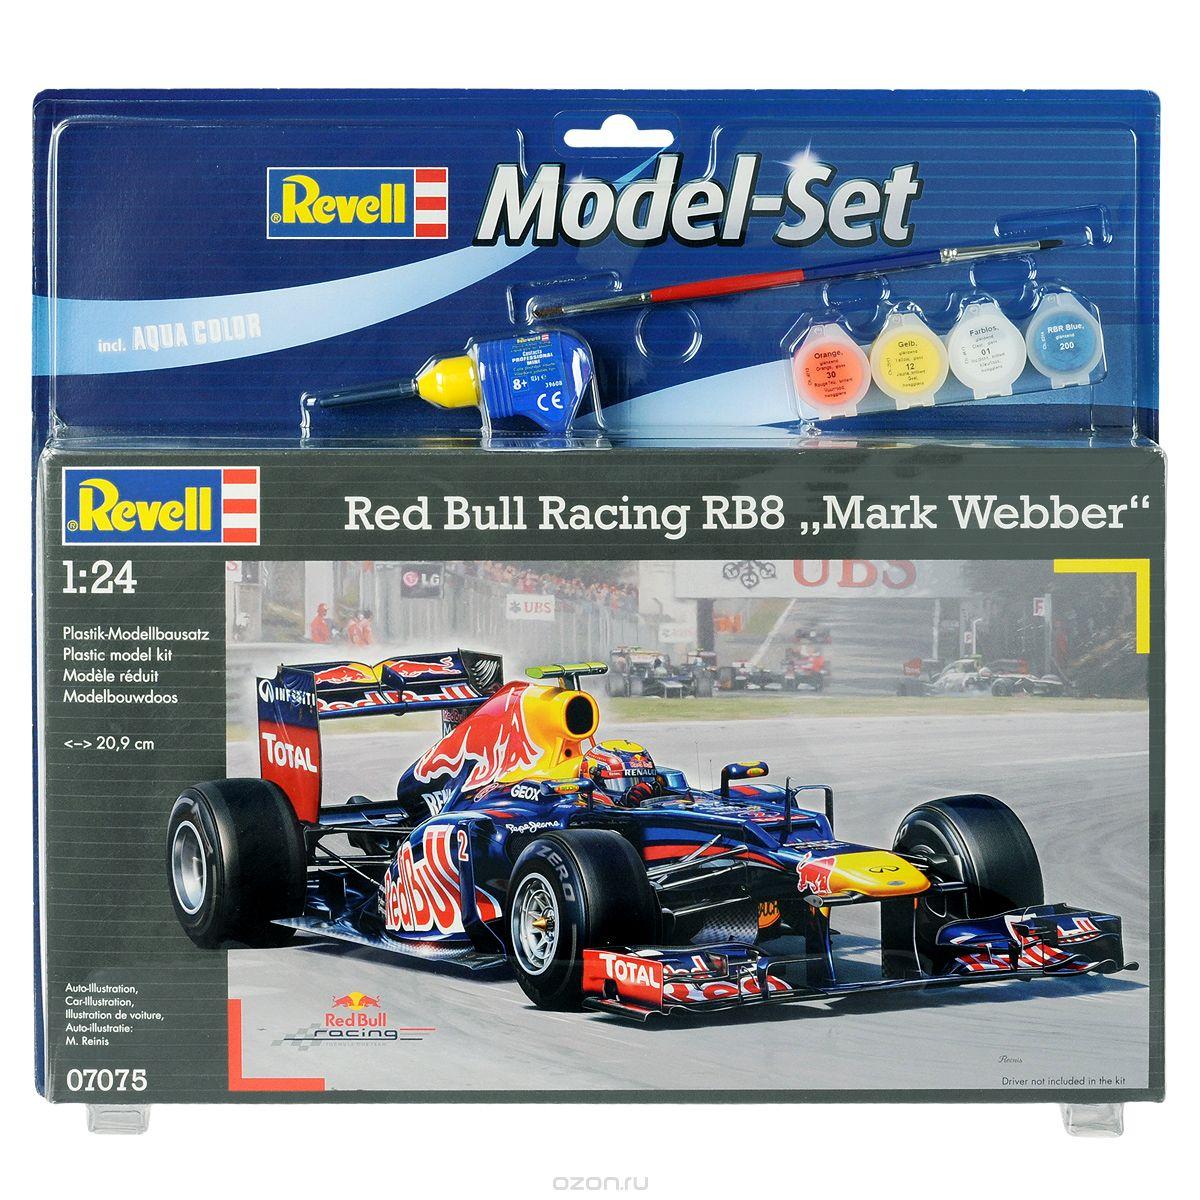 Revell Набор для сборки и раскрашивания модели Red Bull Racing RB8 Mark Webber